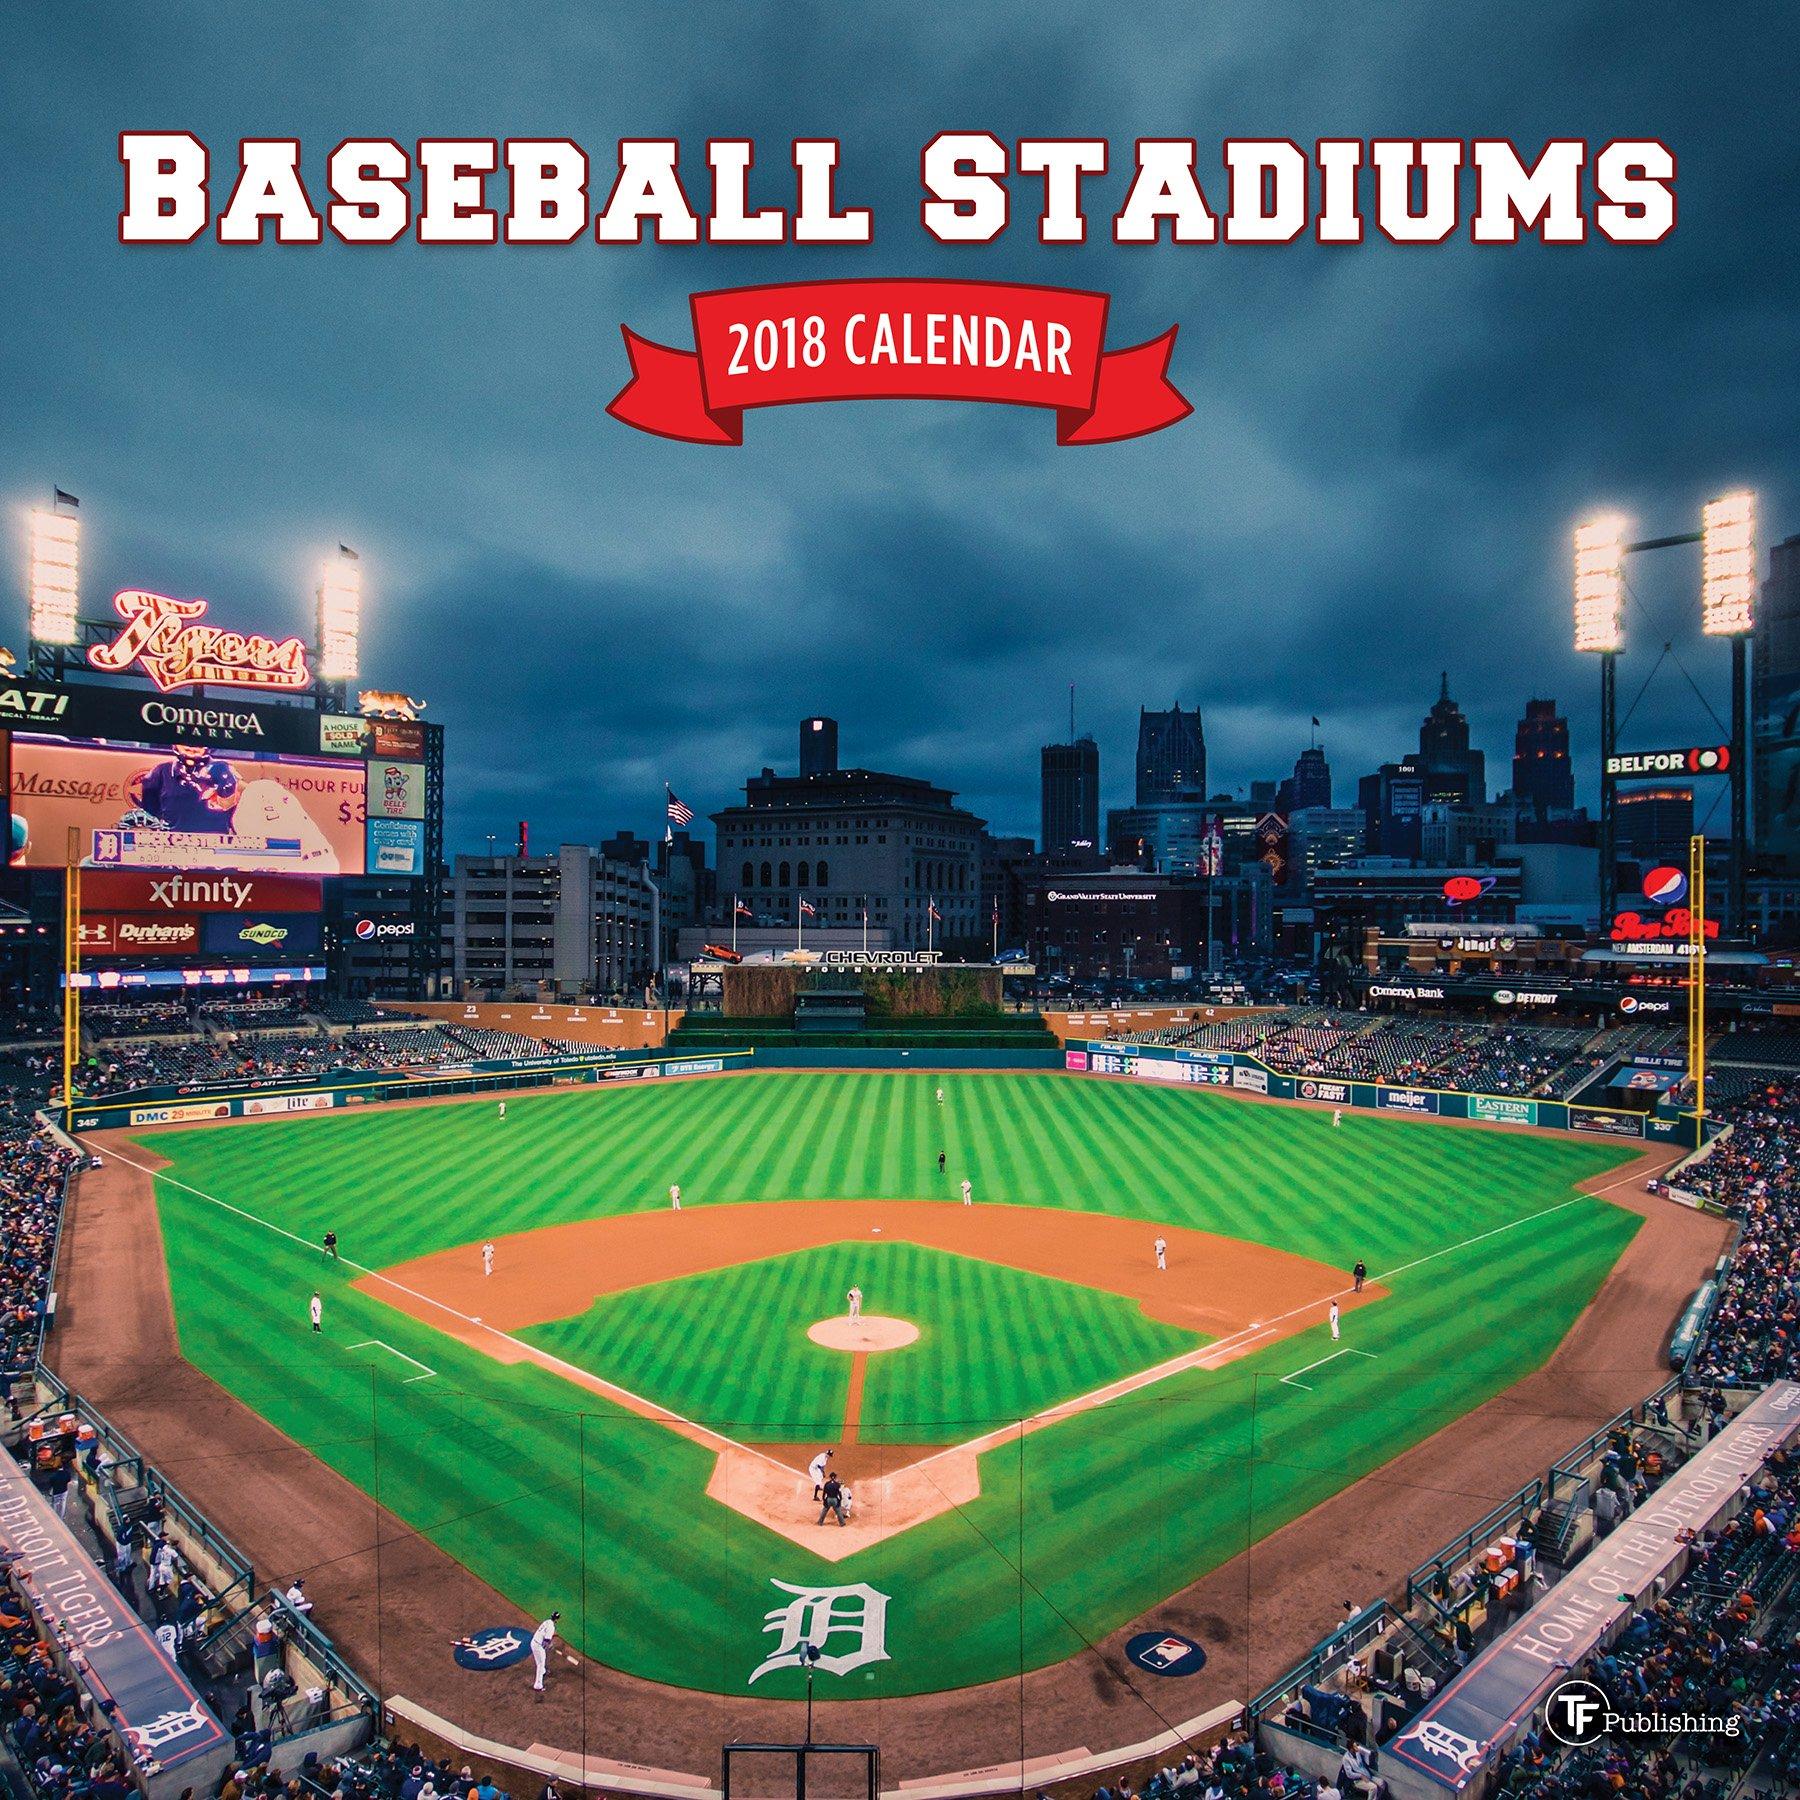 2018 Baseball Stadiums Wall Calendar by Time Factory